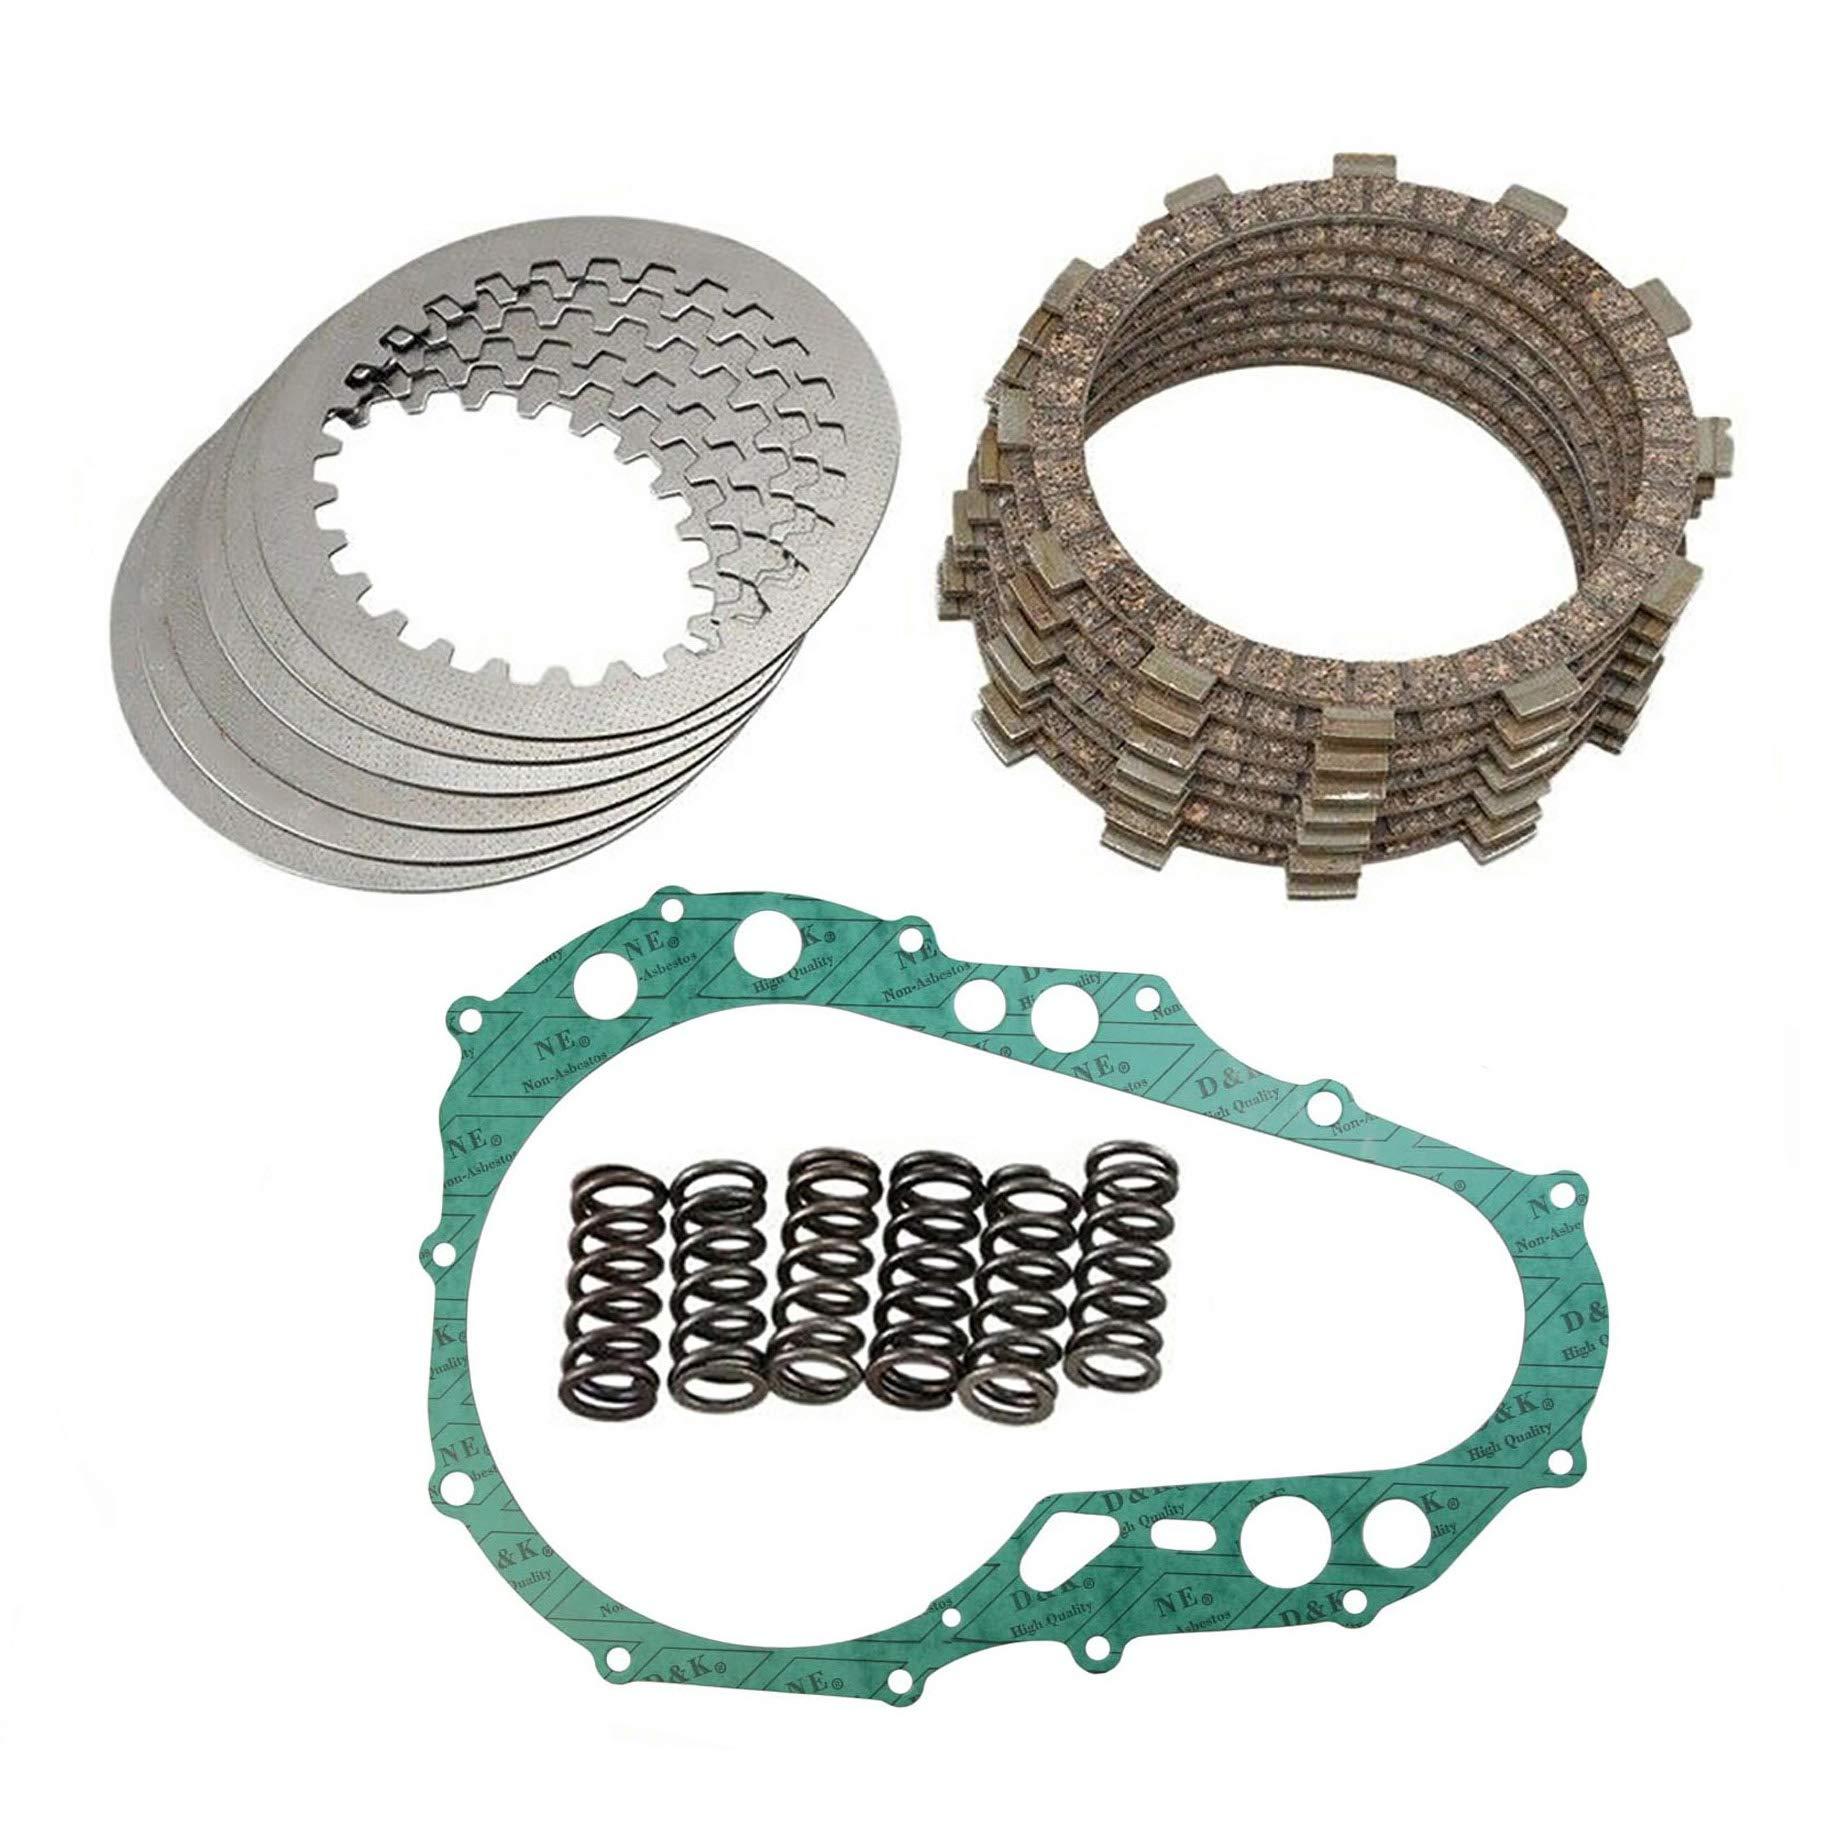 Clutch Kit Compatible Suzuki Quadsport LTZ400 LTZ 400 LT-Z400 2005-2014 Heavy Duty Springs clutch Friction Plates with Gasket Kit with Gasket